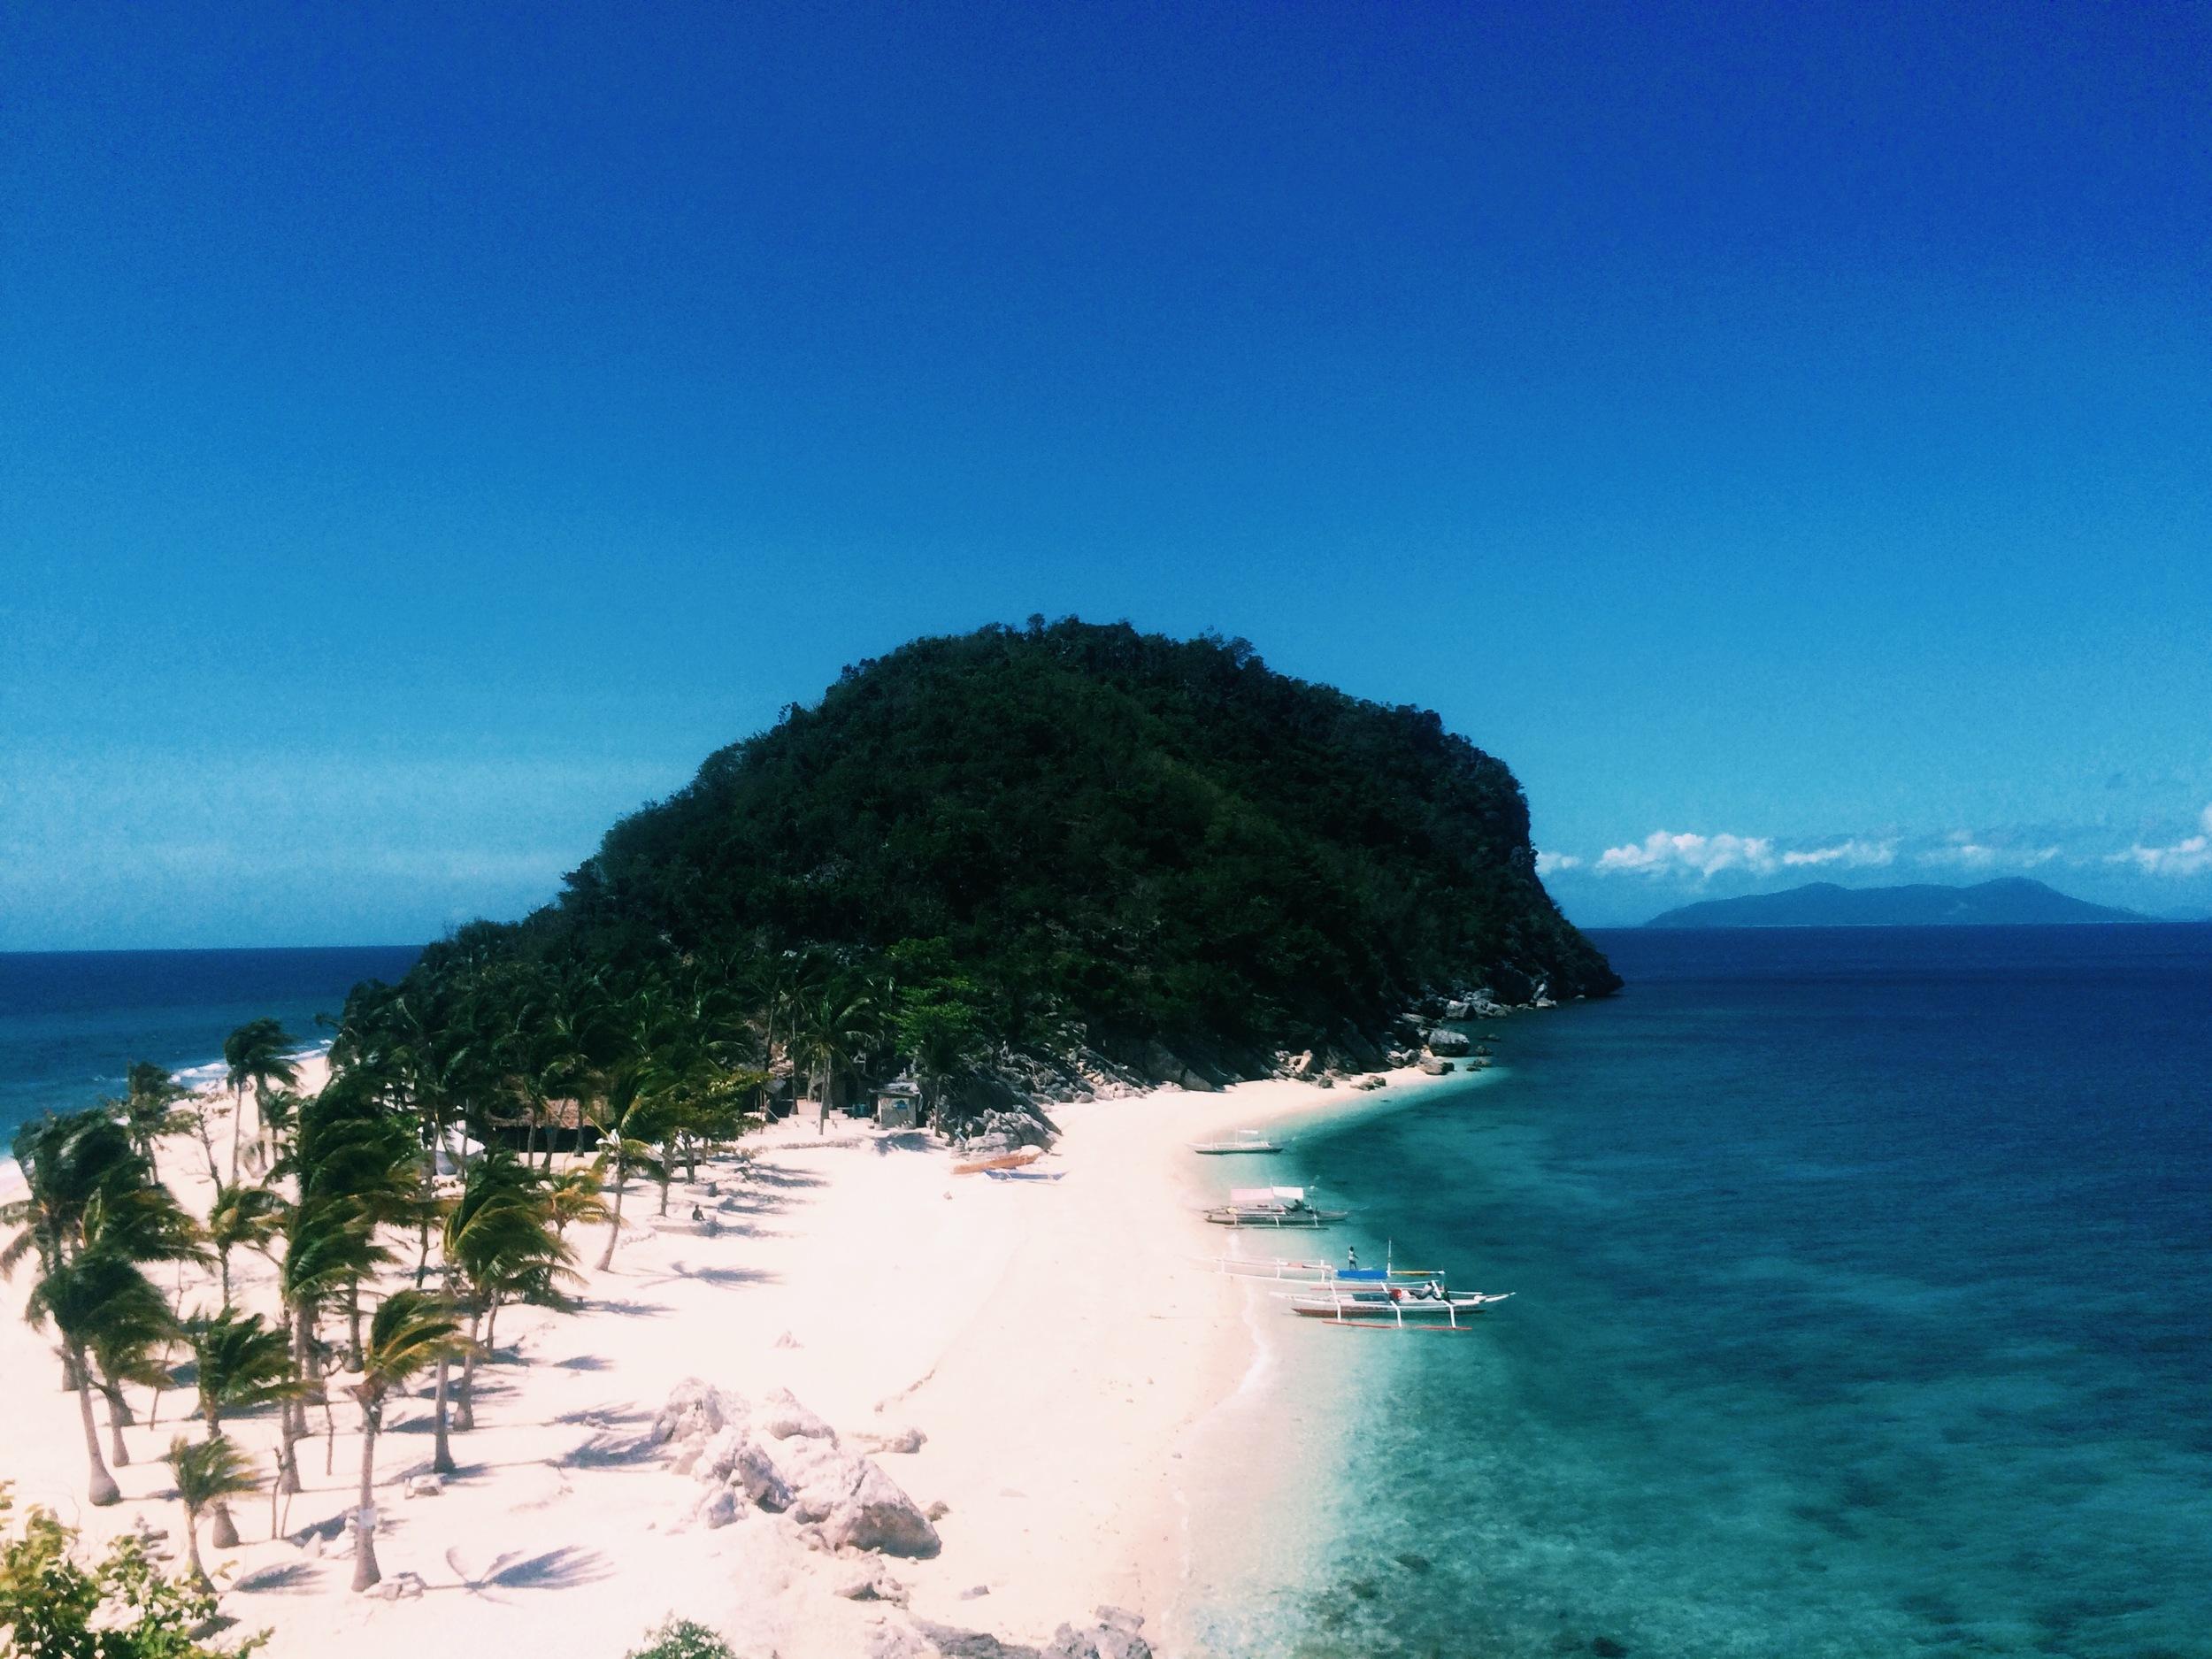 "Islas de Gigantes - Cabugao Gamay岛- illumelbeplay3体育官方下载ation.com"">              </noscript>              <img class="